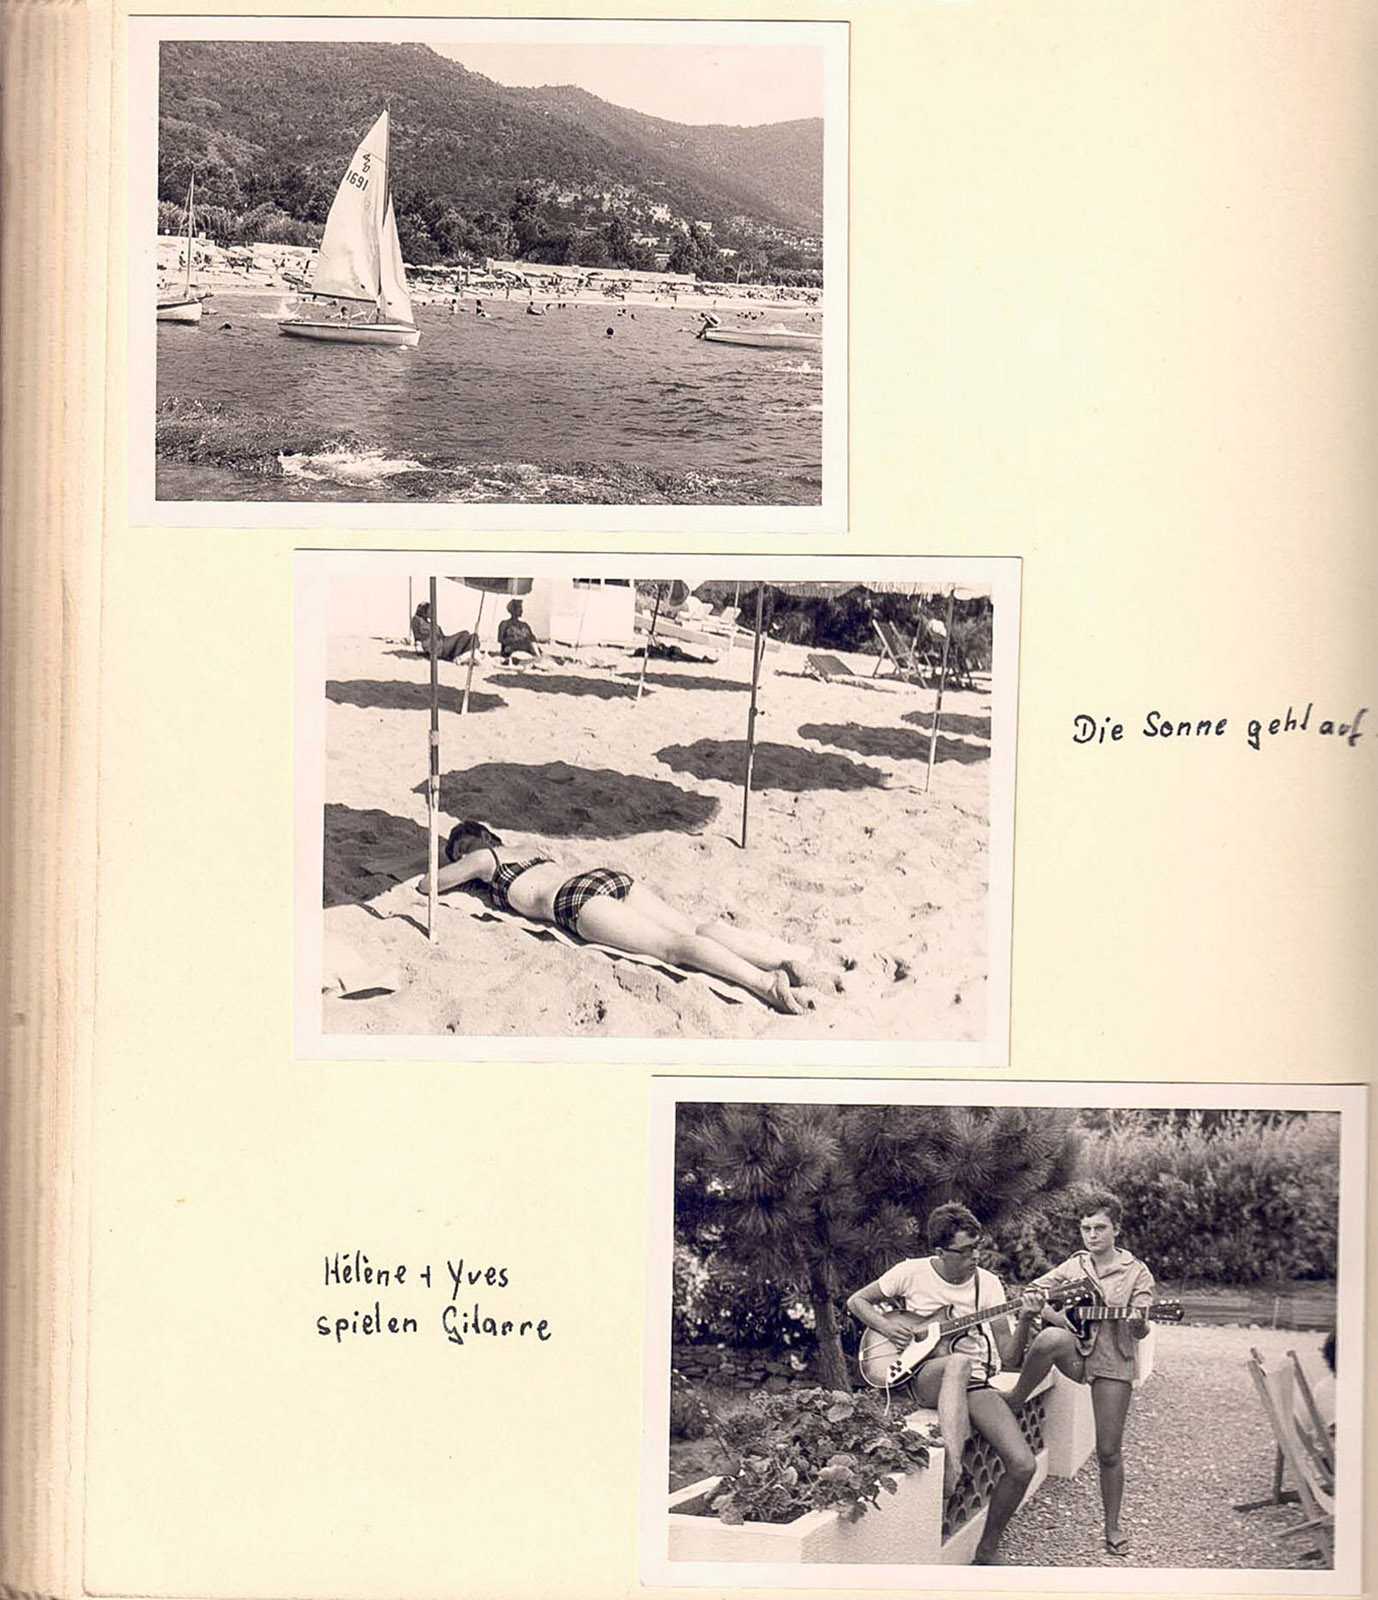 Brita Beate Link: im Fotoalbum geblättert. Fotos: privat